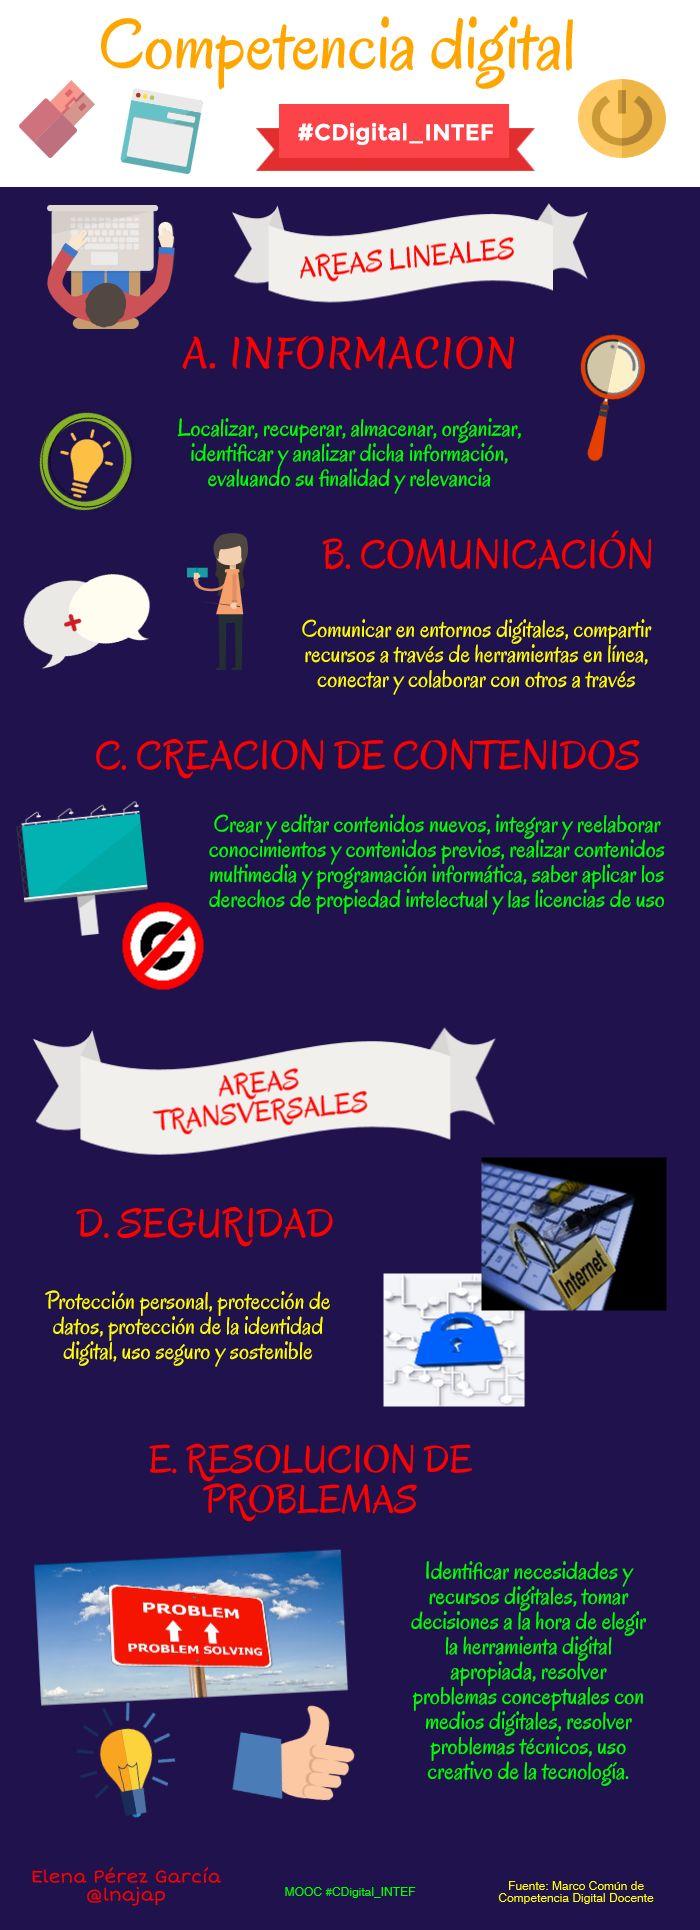 Infografía MOOC #CDigital_INTEF sobre la CD